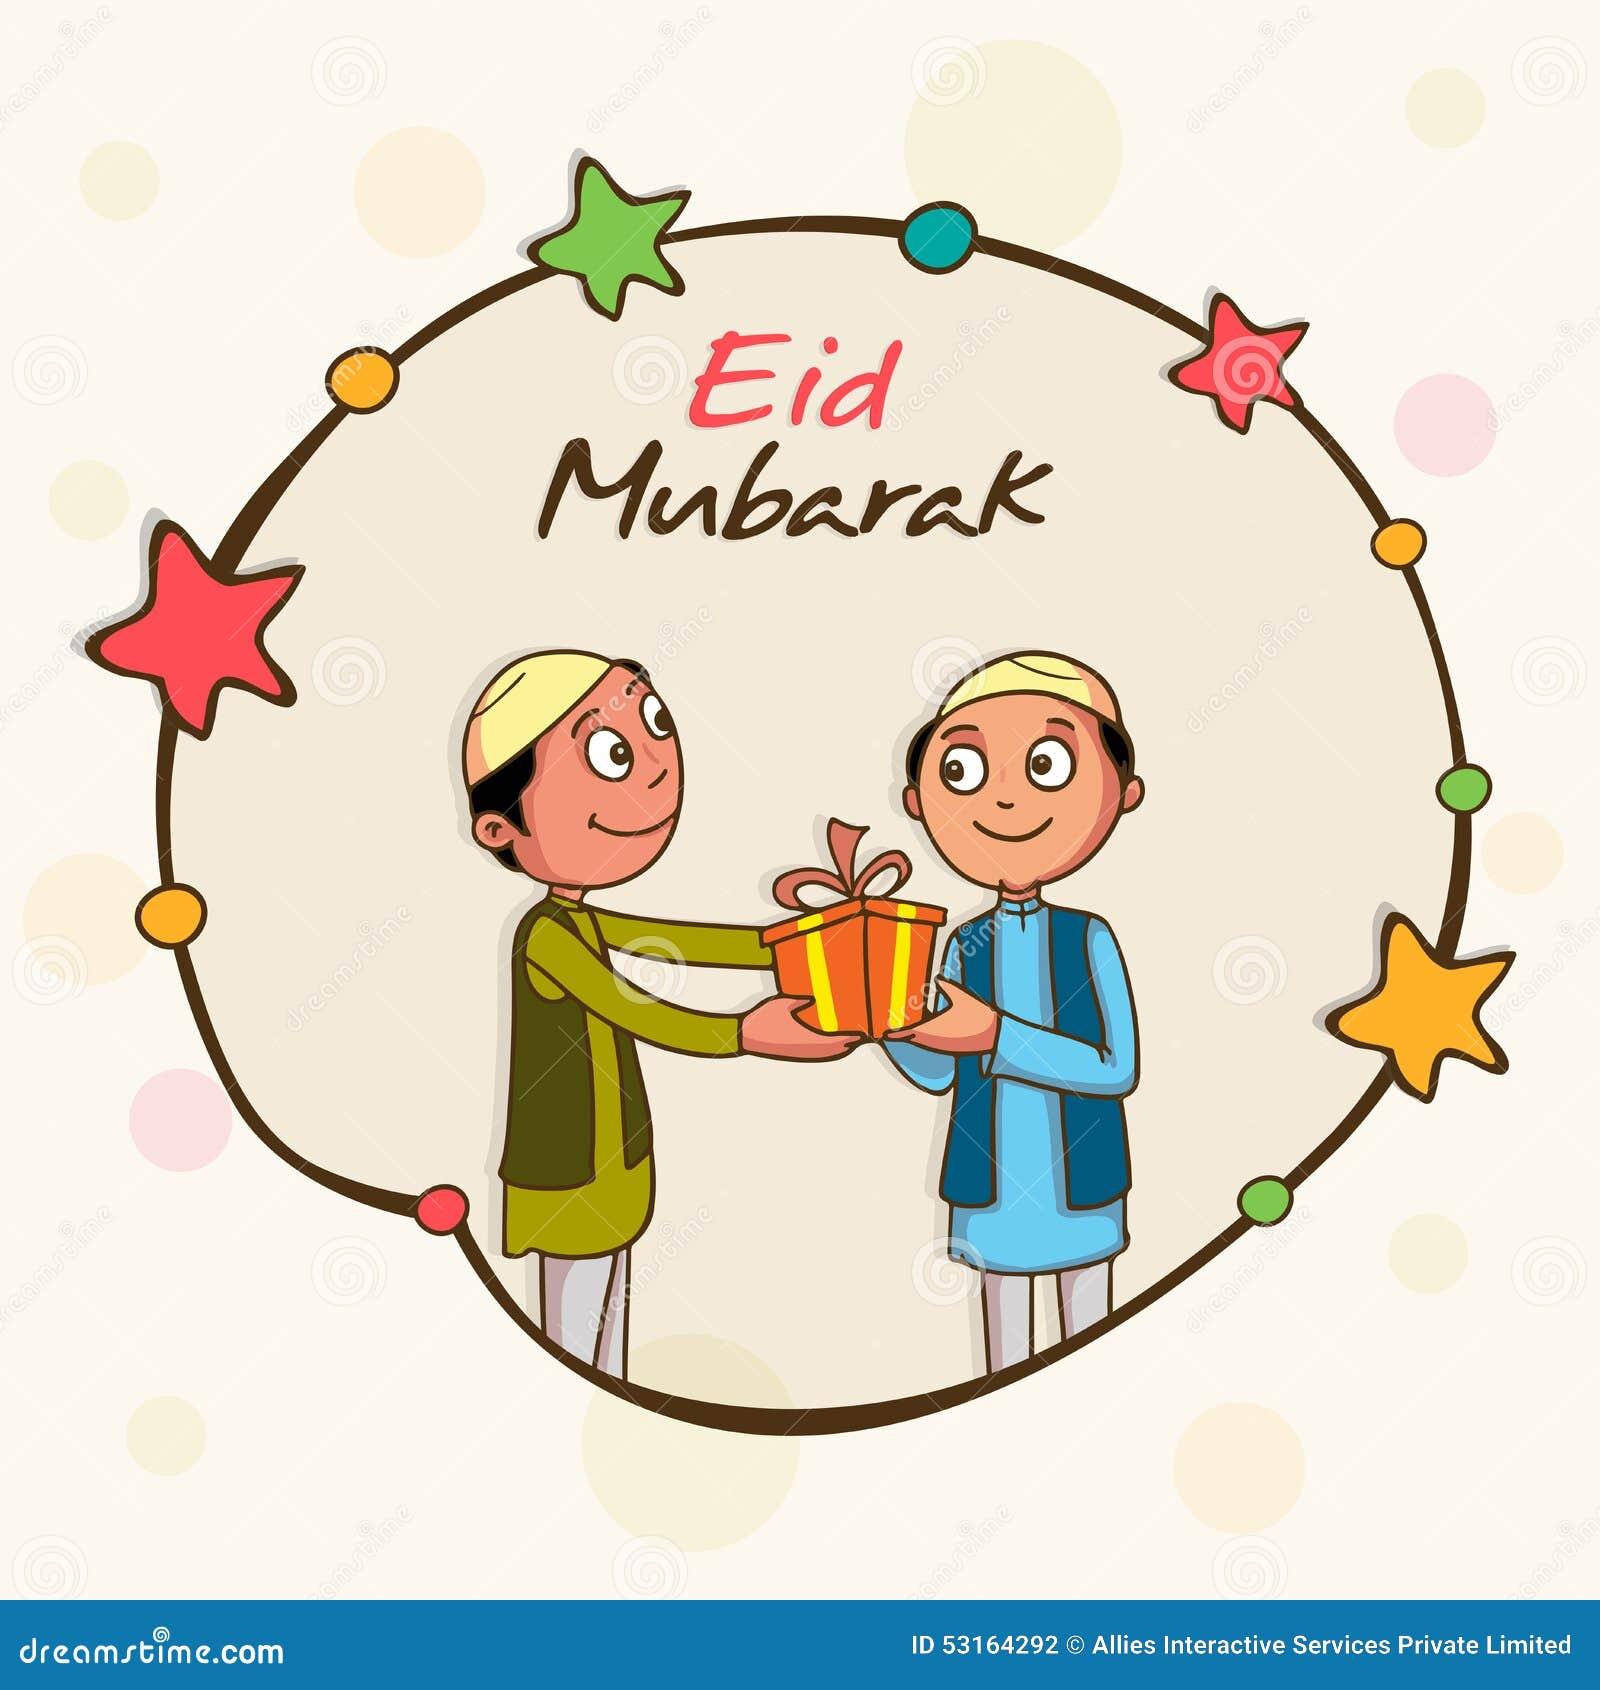 Eid Mubarak Celebration With Cute Kids. Stock Illustration ...